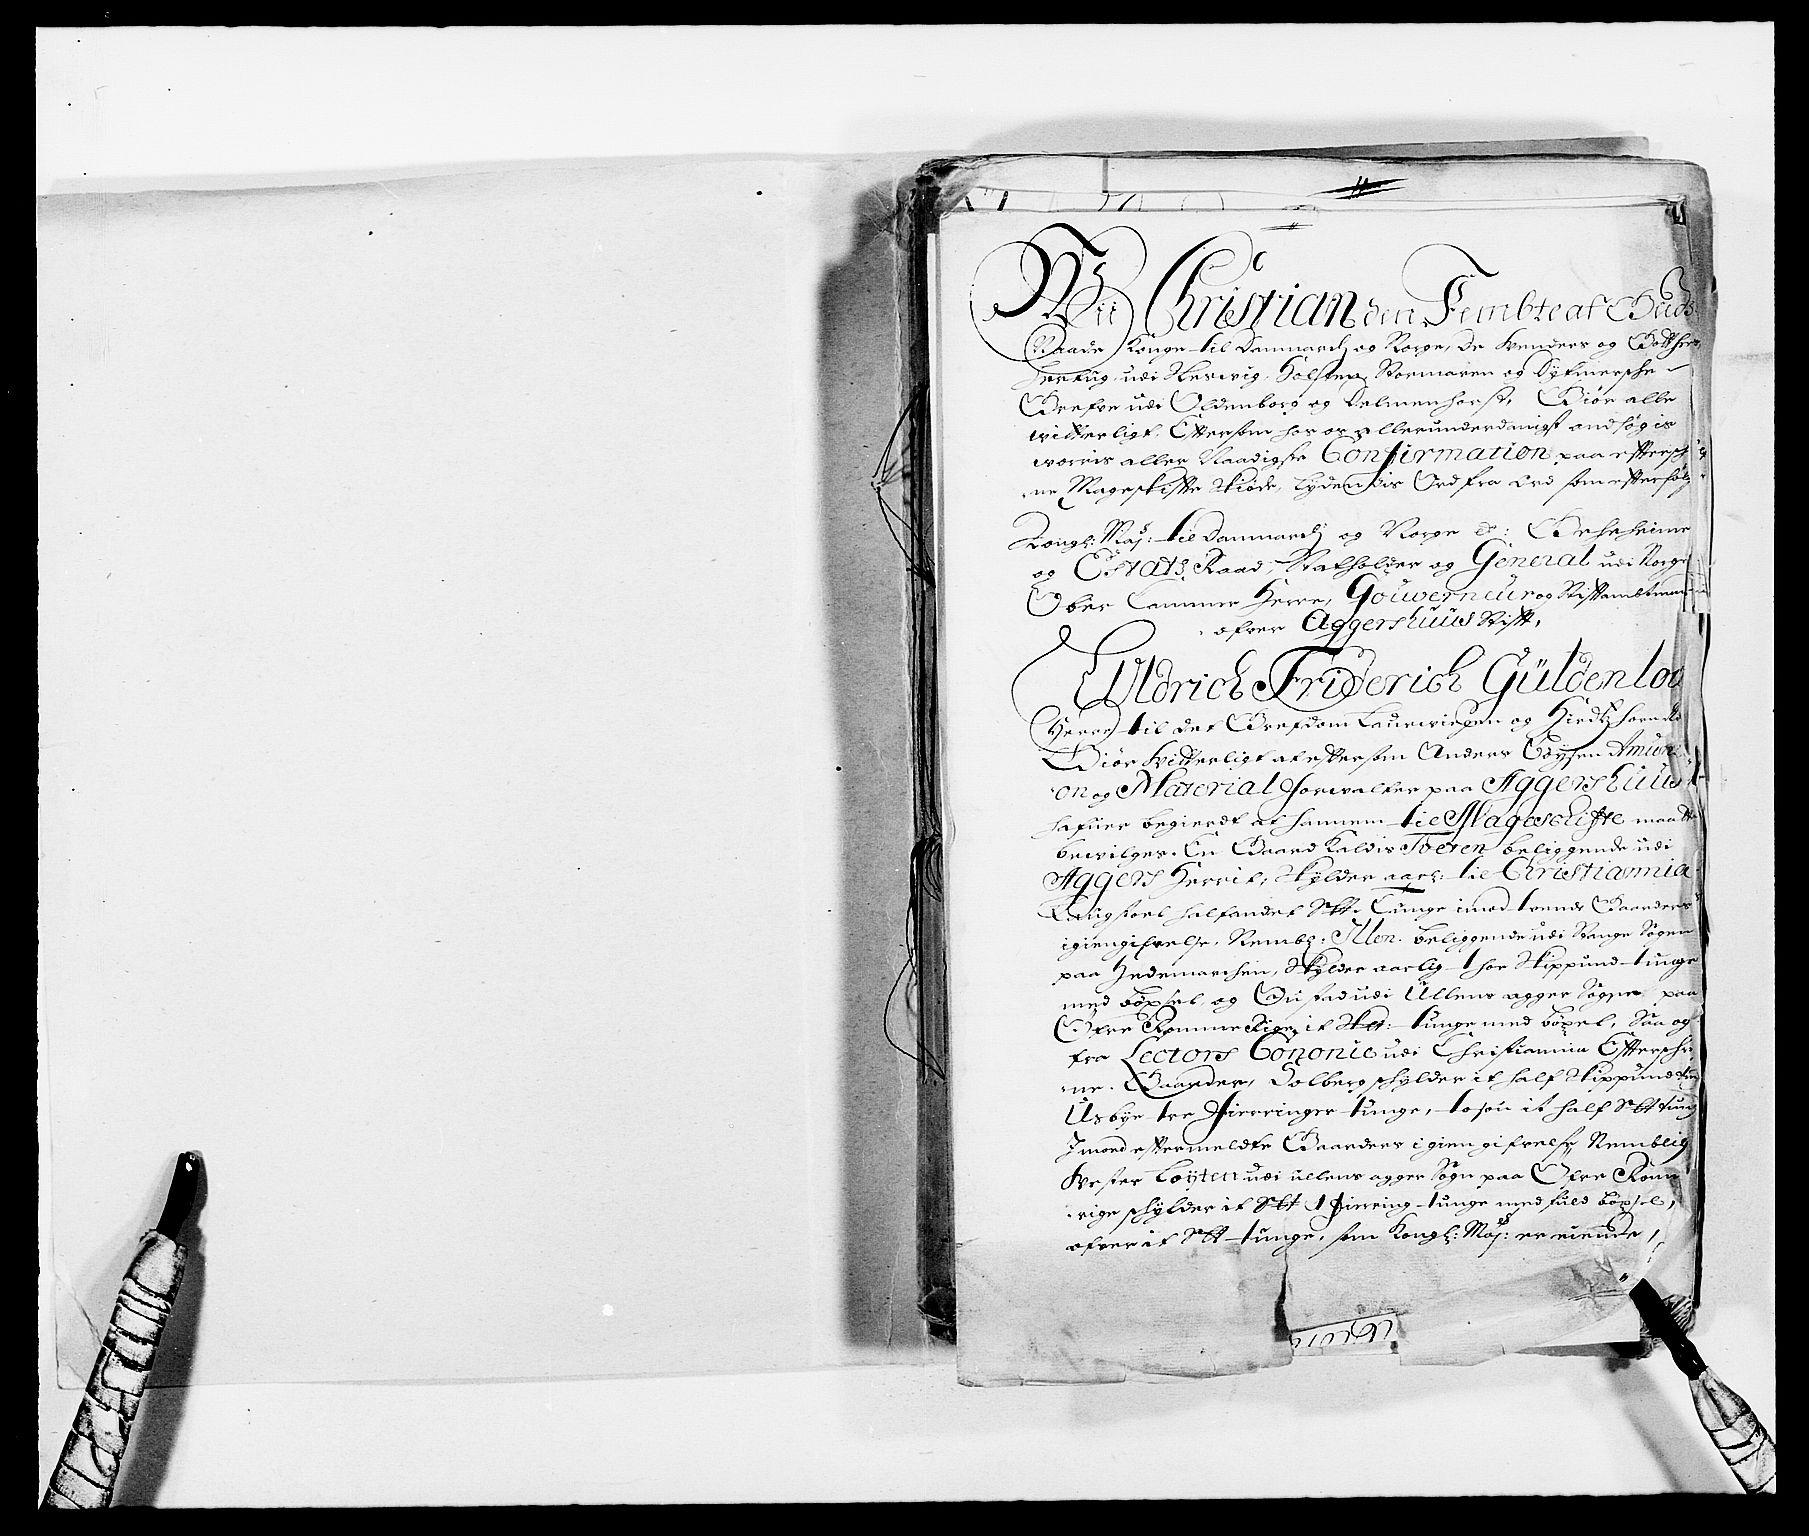 RA, Rentekammeret inntil 1814, Reviderte regnskaper, Fogderegnskap, R09/L0434: Fogderegnskap Follo, 1687-1688, s. 9